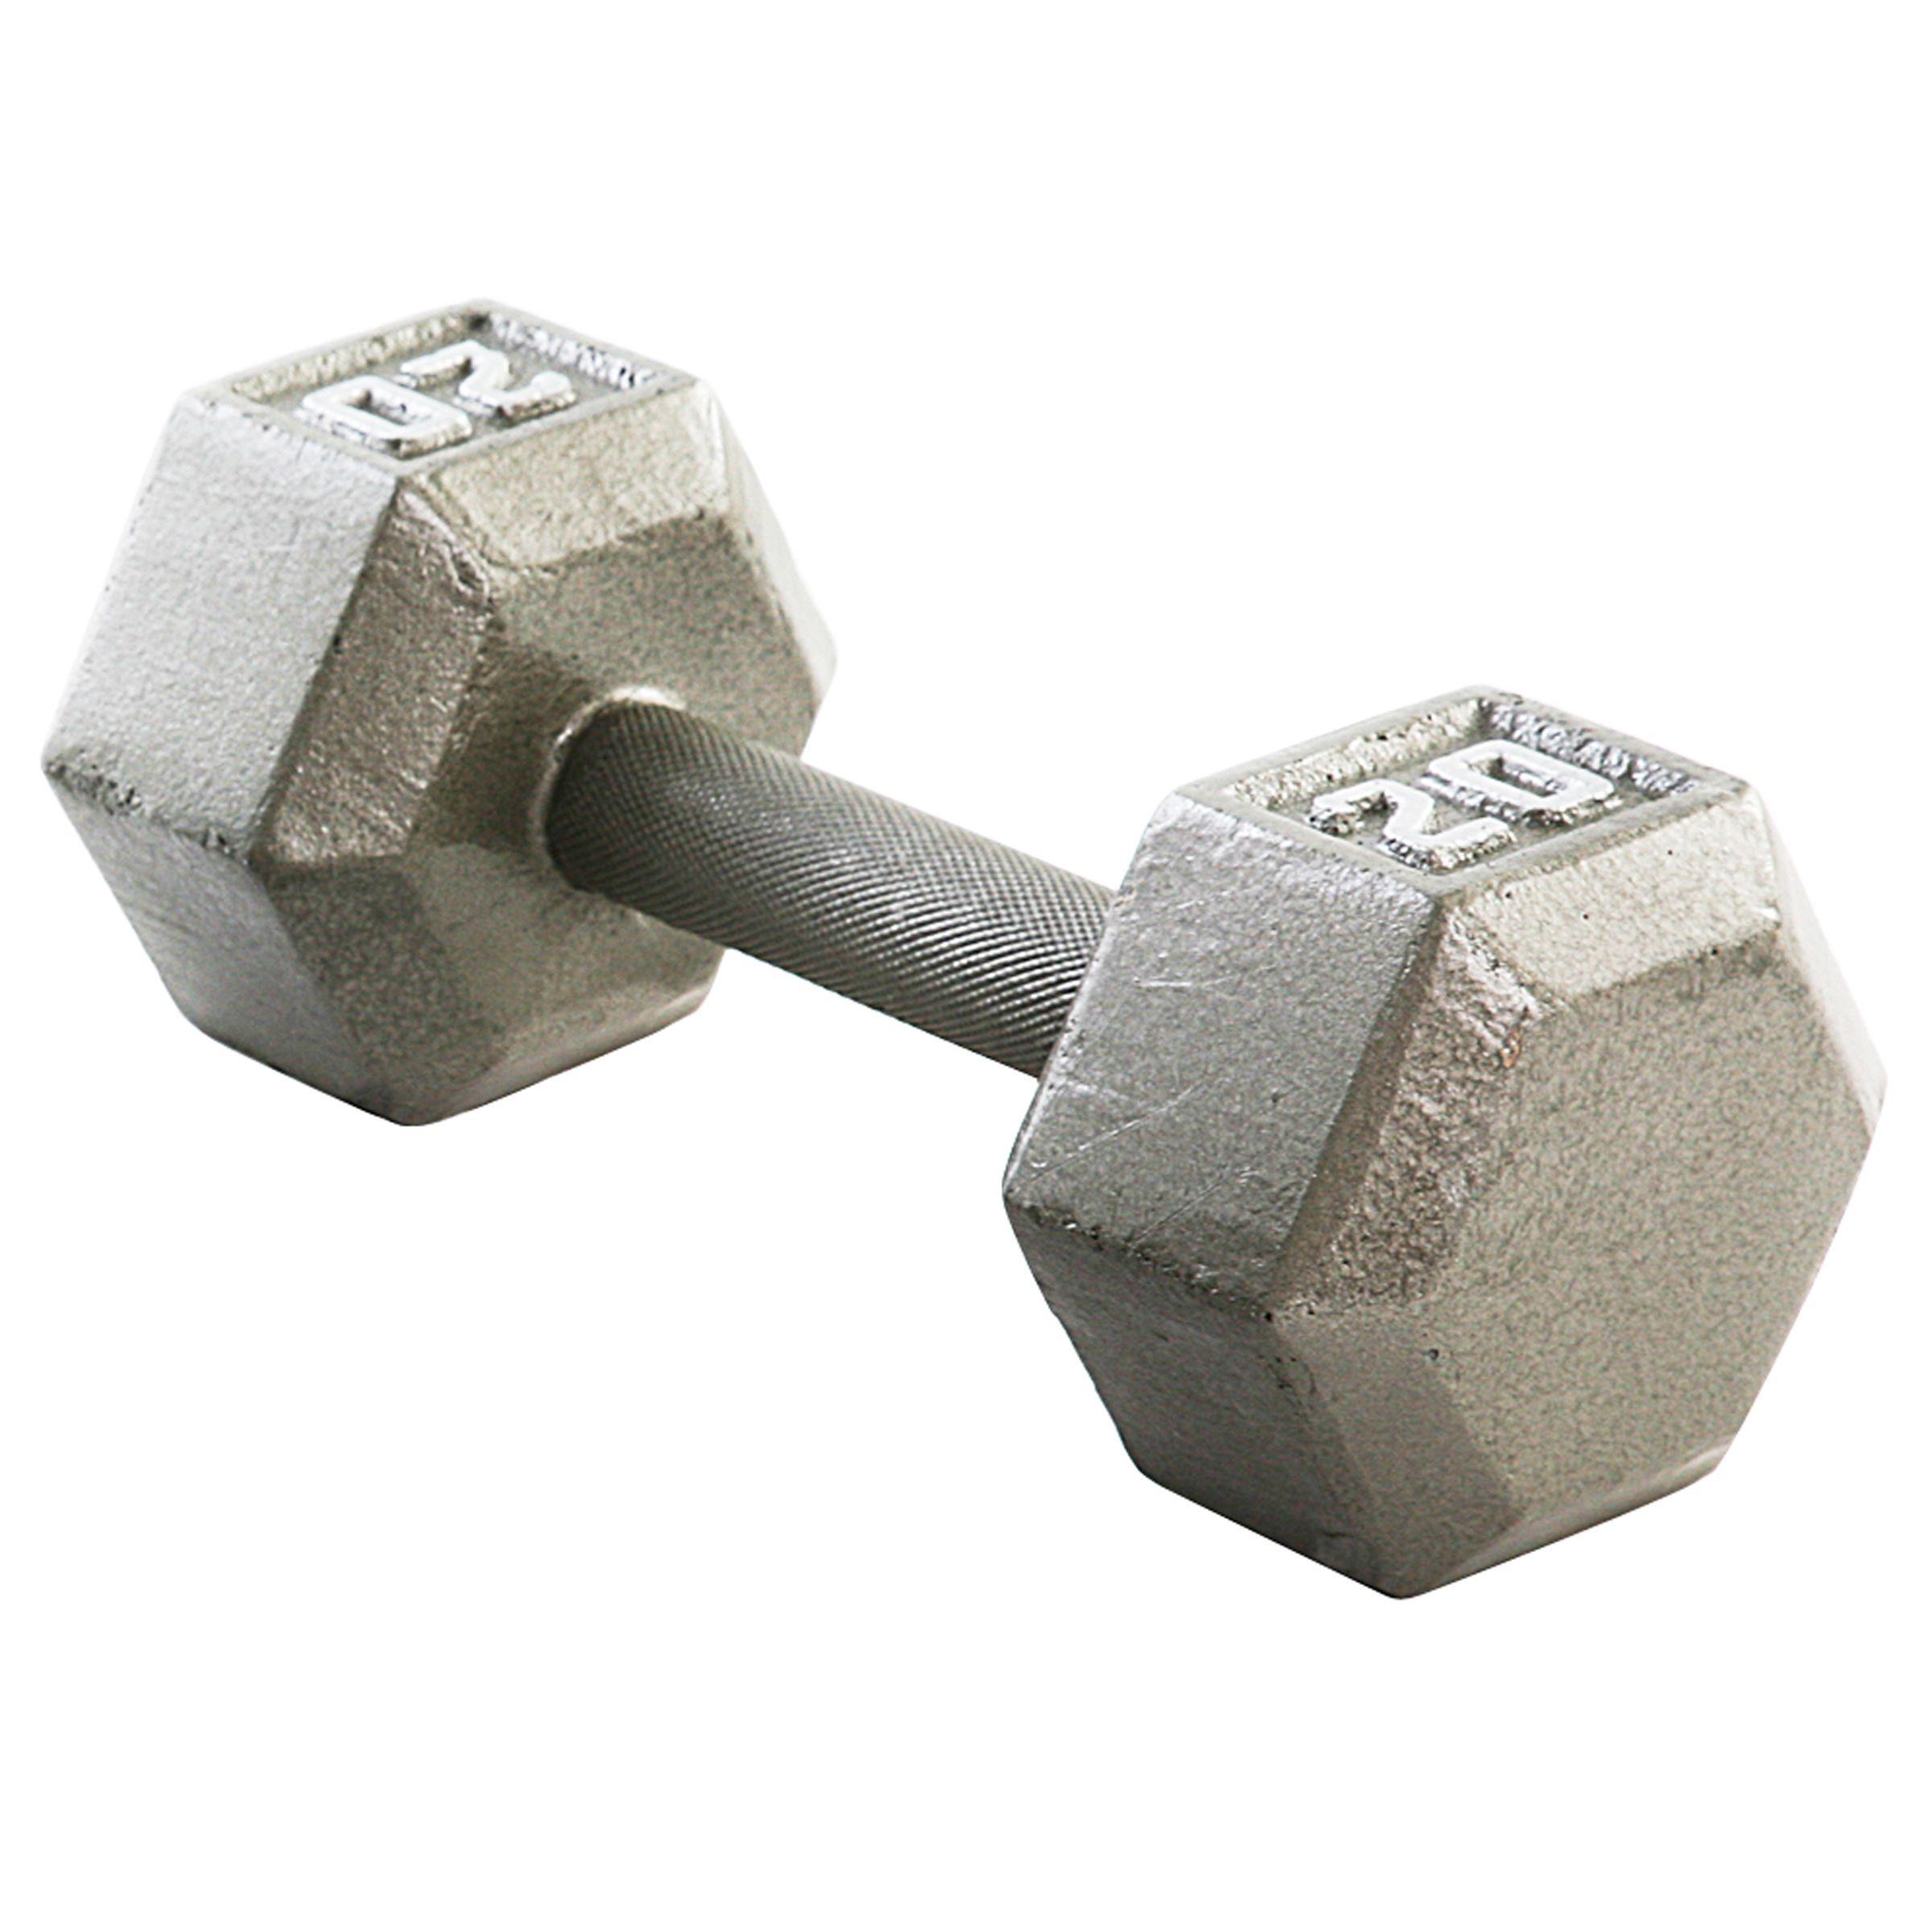 Weider 20 lb. Hex Dumbbell Fitness & Sports Strength